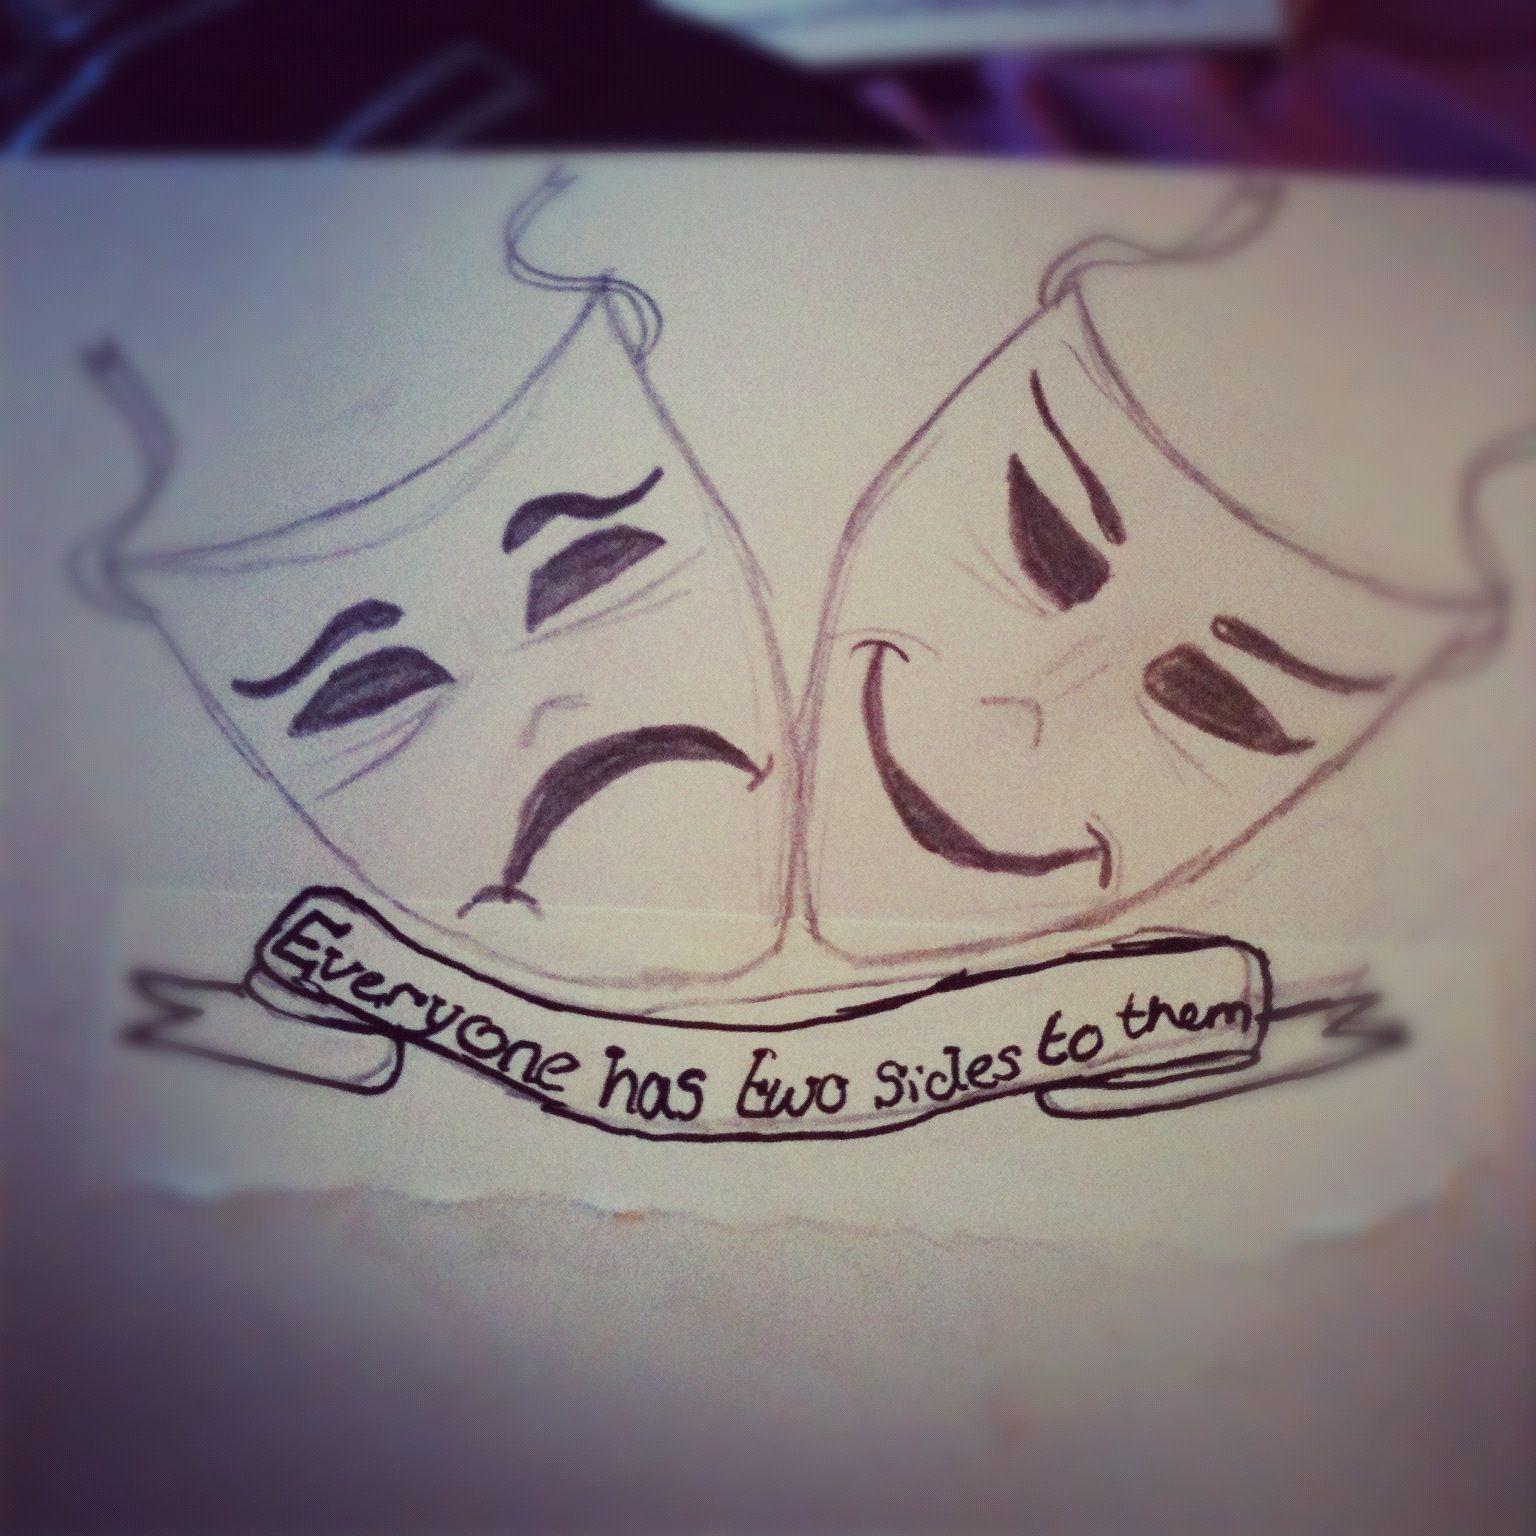 Happy and sad face masks happy and sad face tattoos -  Drama Masks Happy Sad Twosides